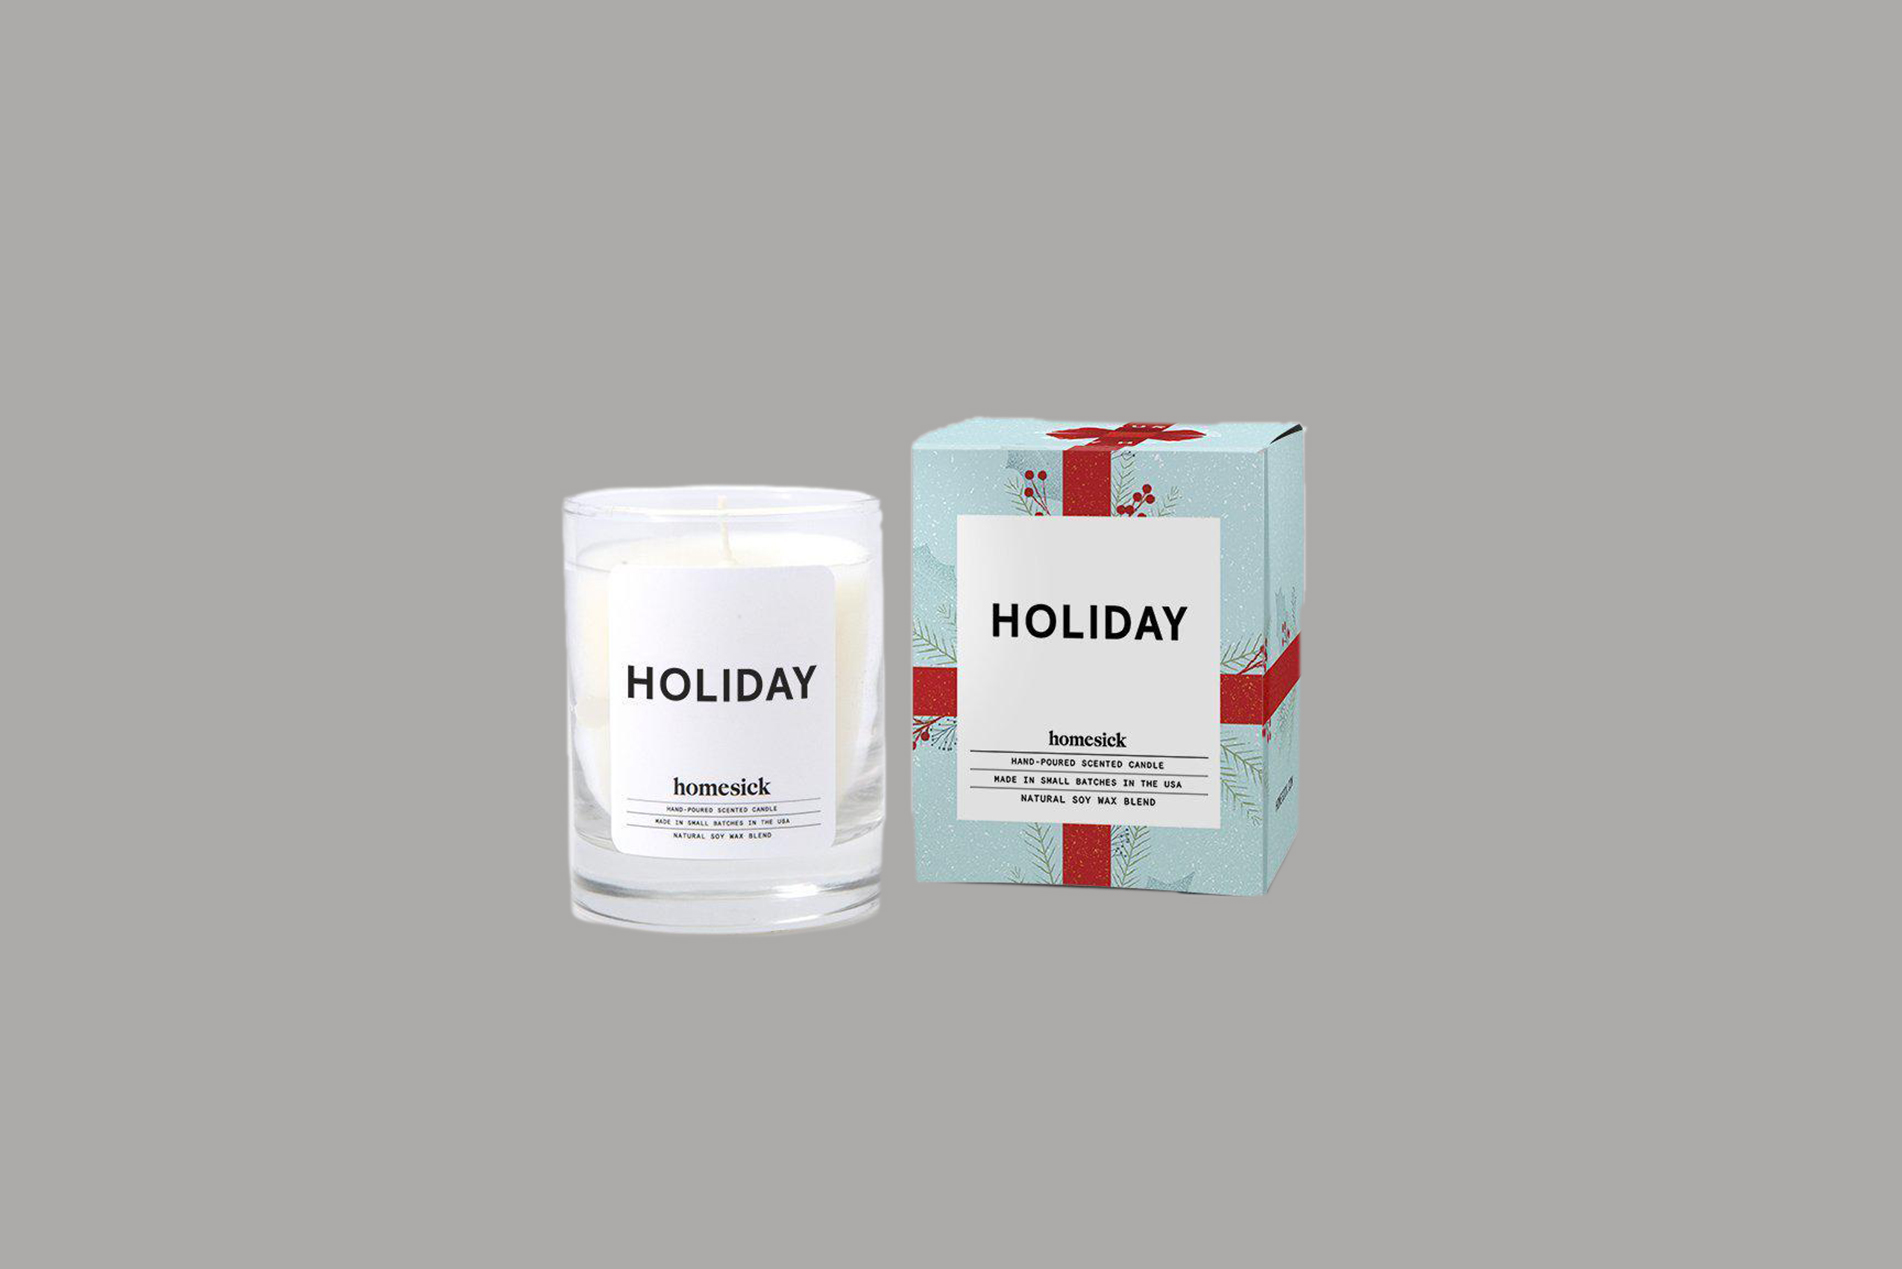 homesick holiday candle stocking stuffer